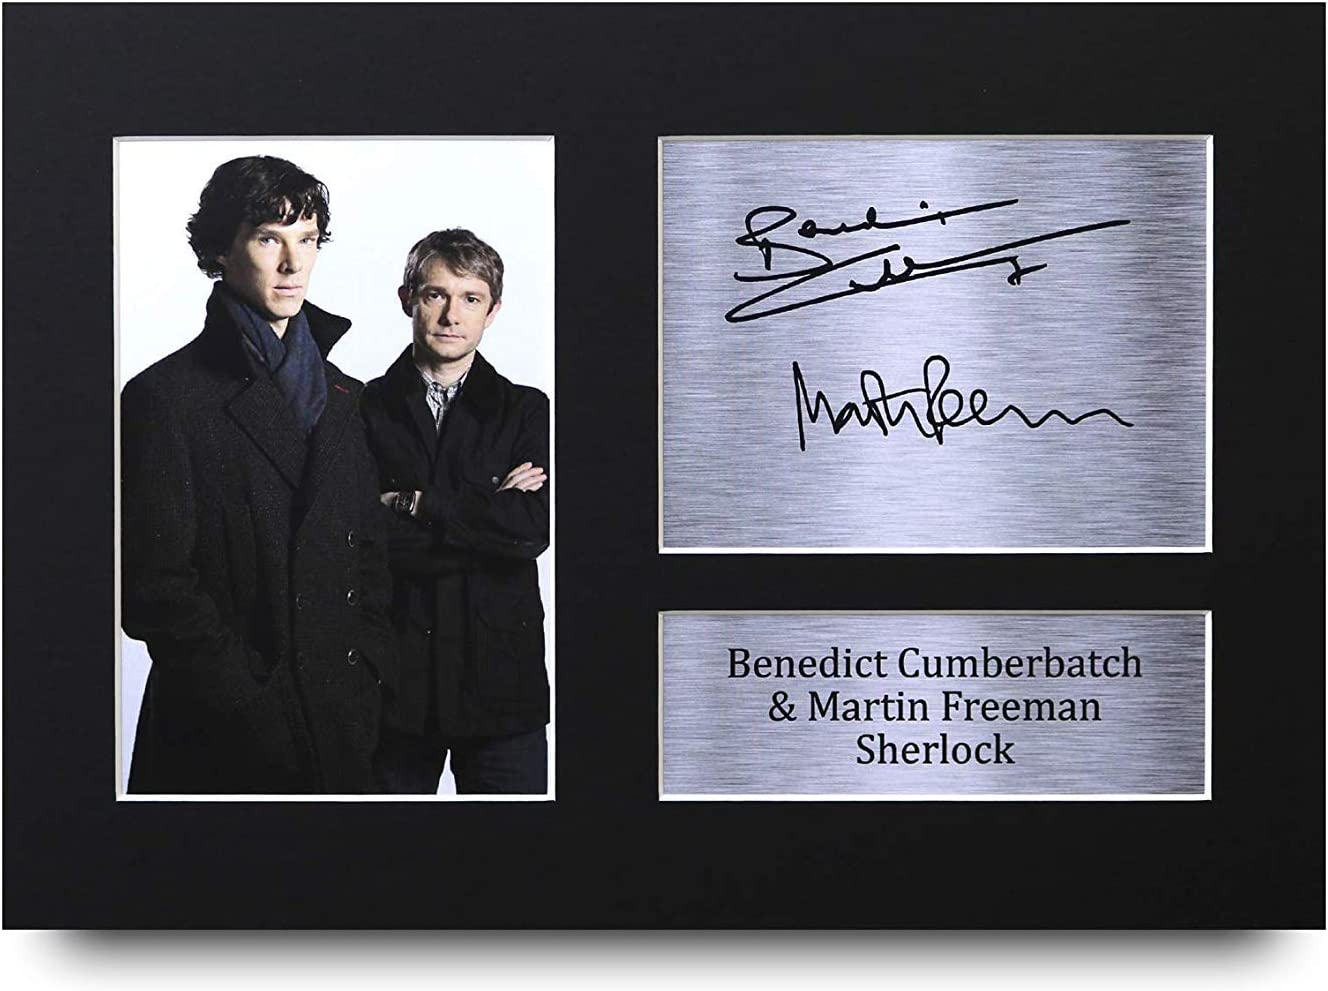 HWC Trading Sherlock A4 Sin Marco Regalo De Visualización De Fotos De Impresión De Imagen Impresa Autógrafo Firmado por Benedict Cumberbatch Martin Freeman Ventiladores De Programa De TV